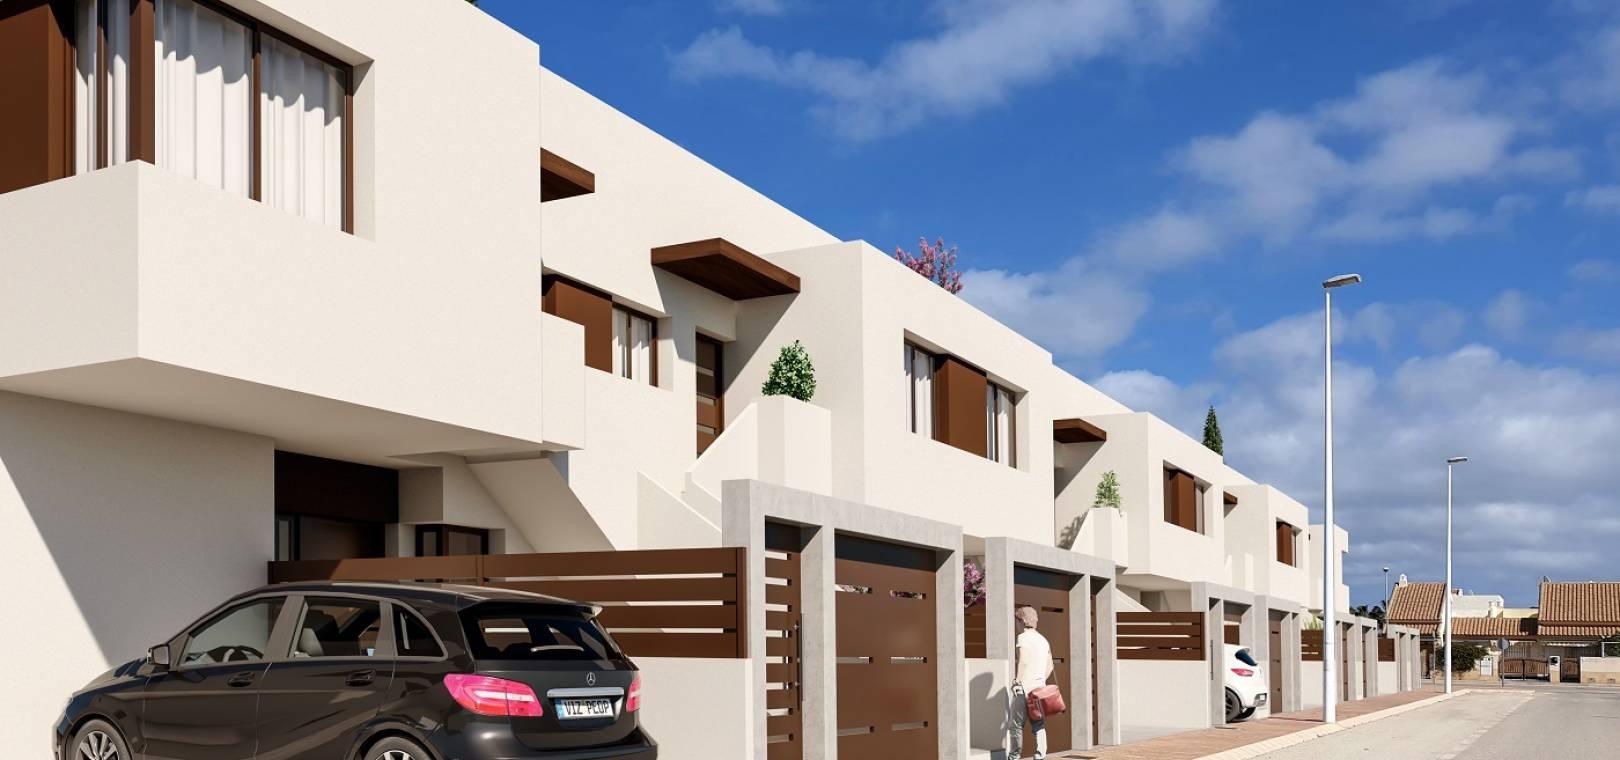 San_Pedro_del_Pinatar_Buy_New_Modern_Penthouse_Apartments_nsp202-5